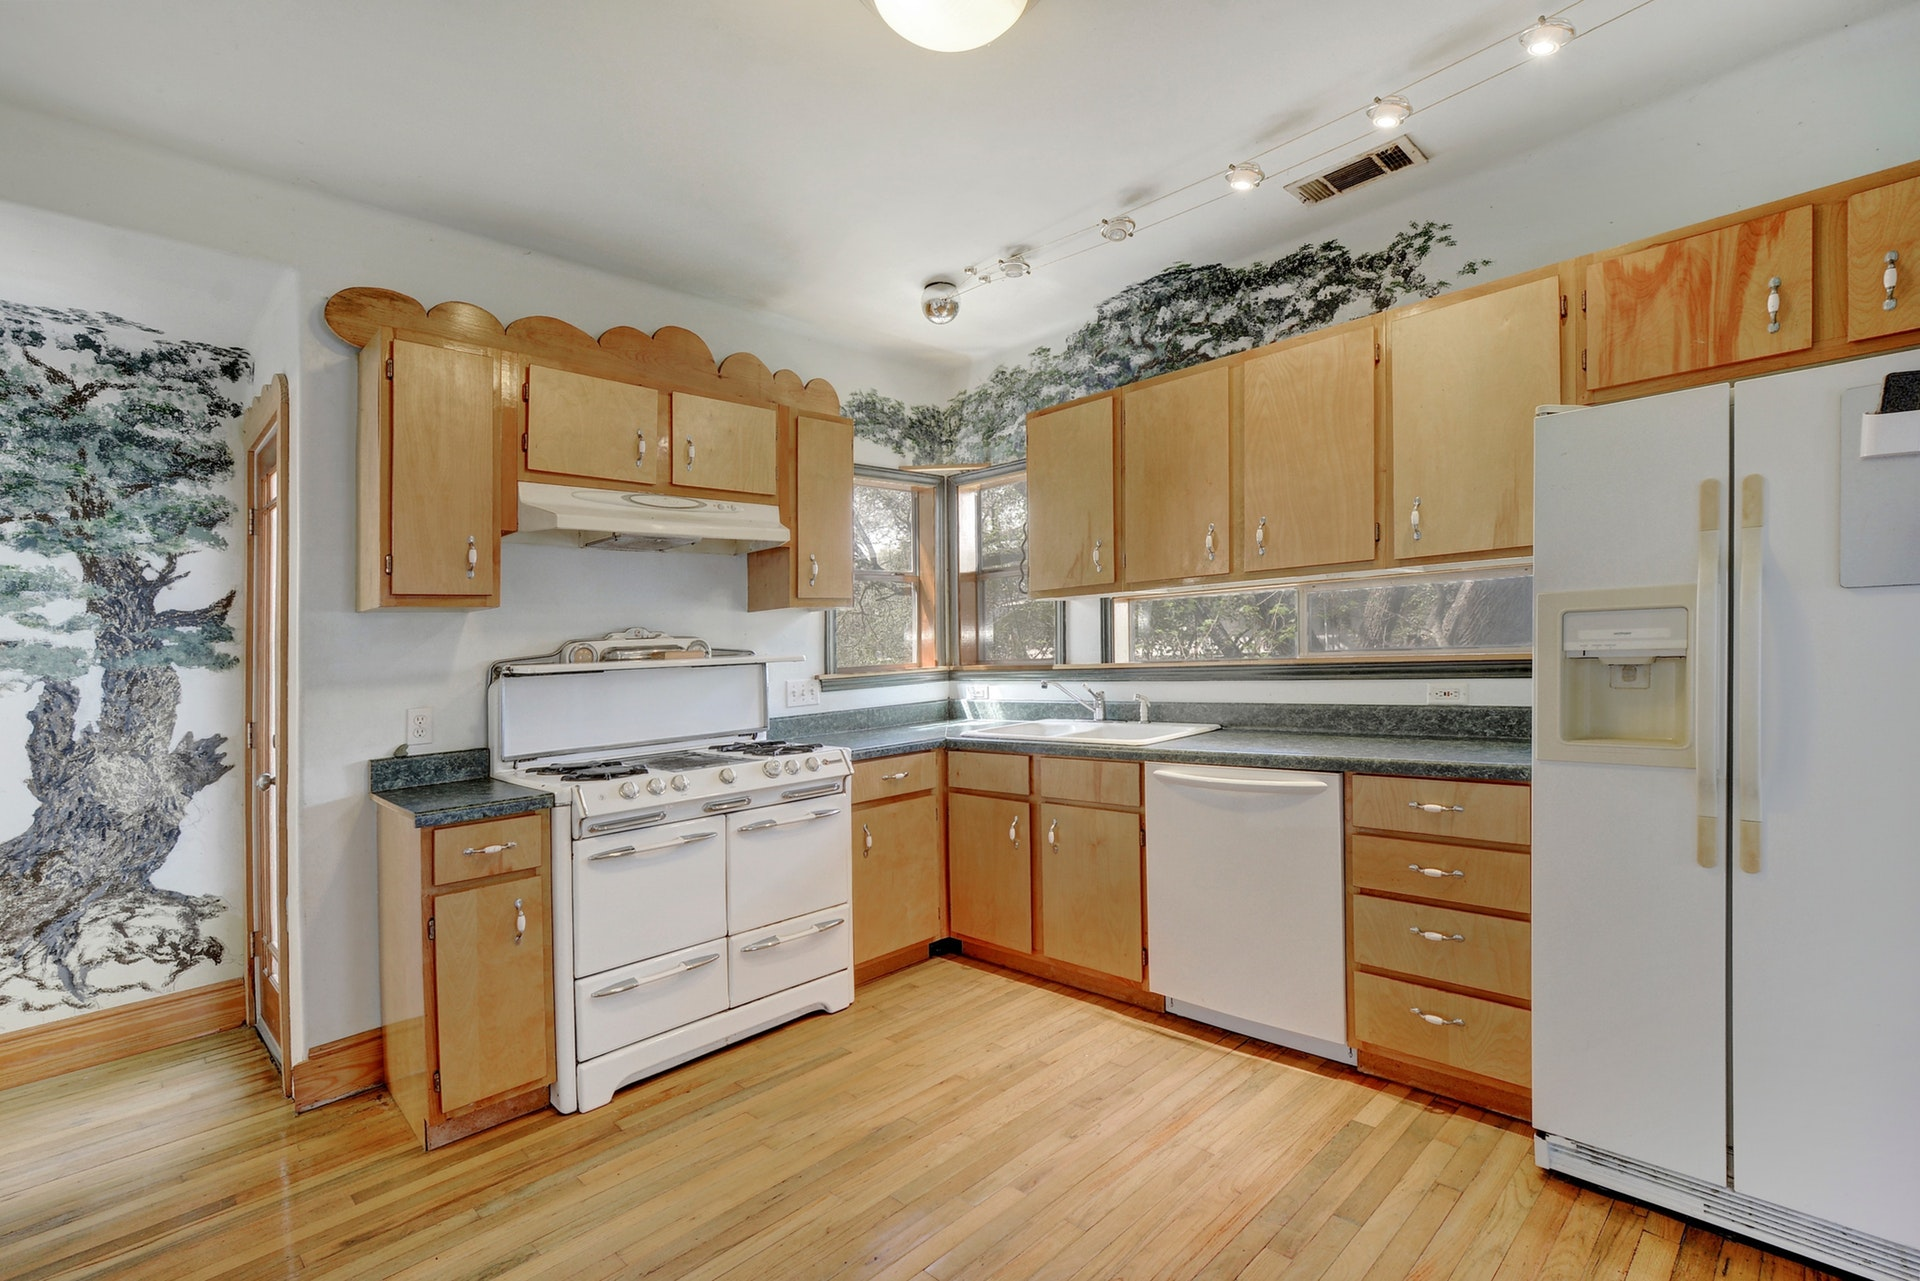 009-264873-Family Kitchen Dining007_6118492.jpg